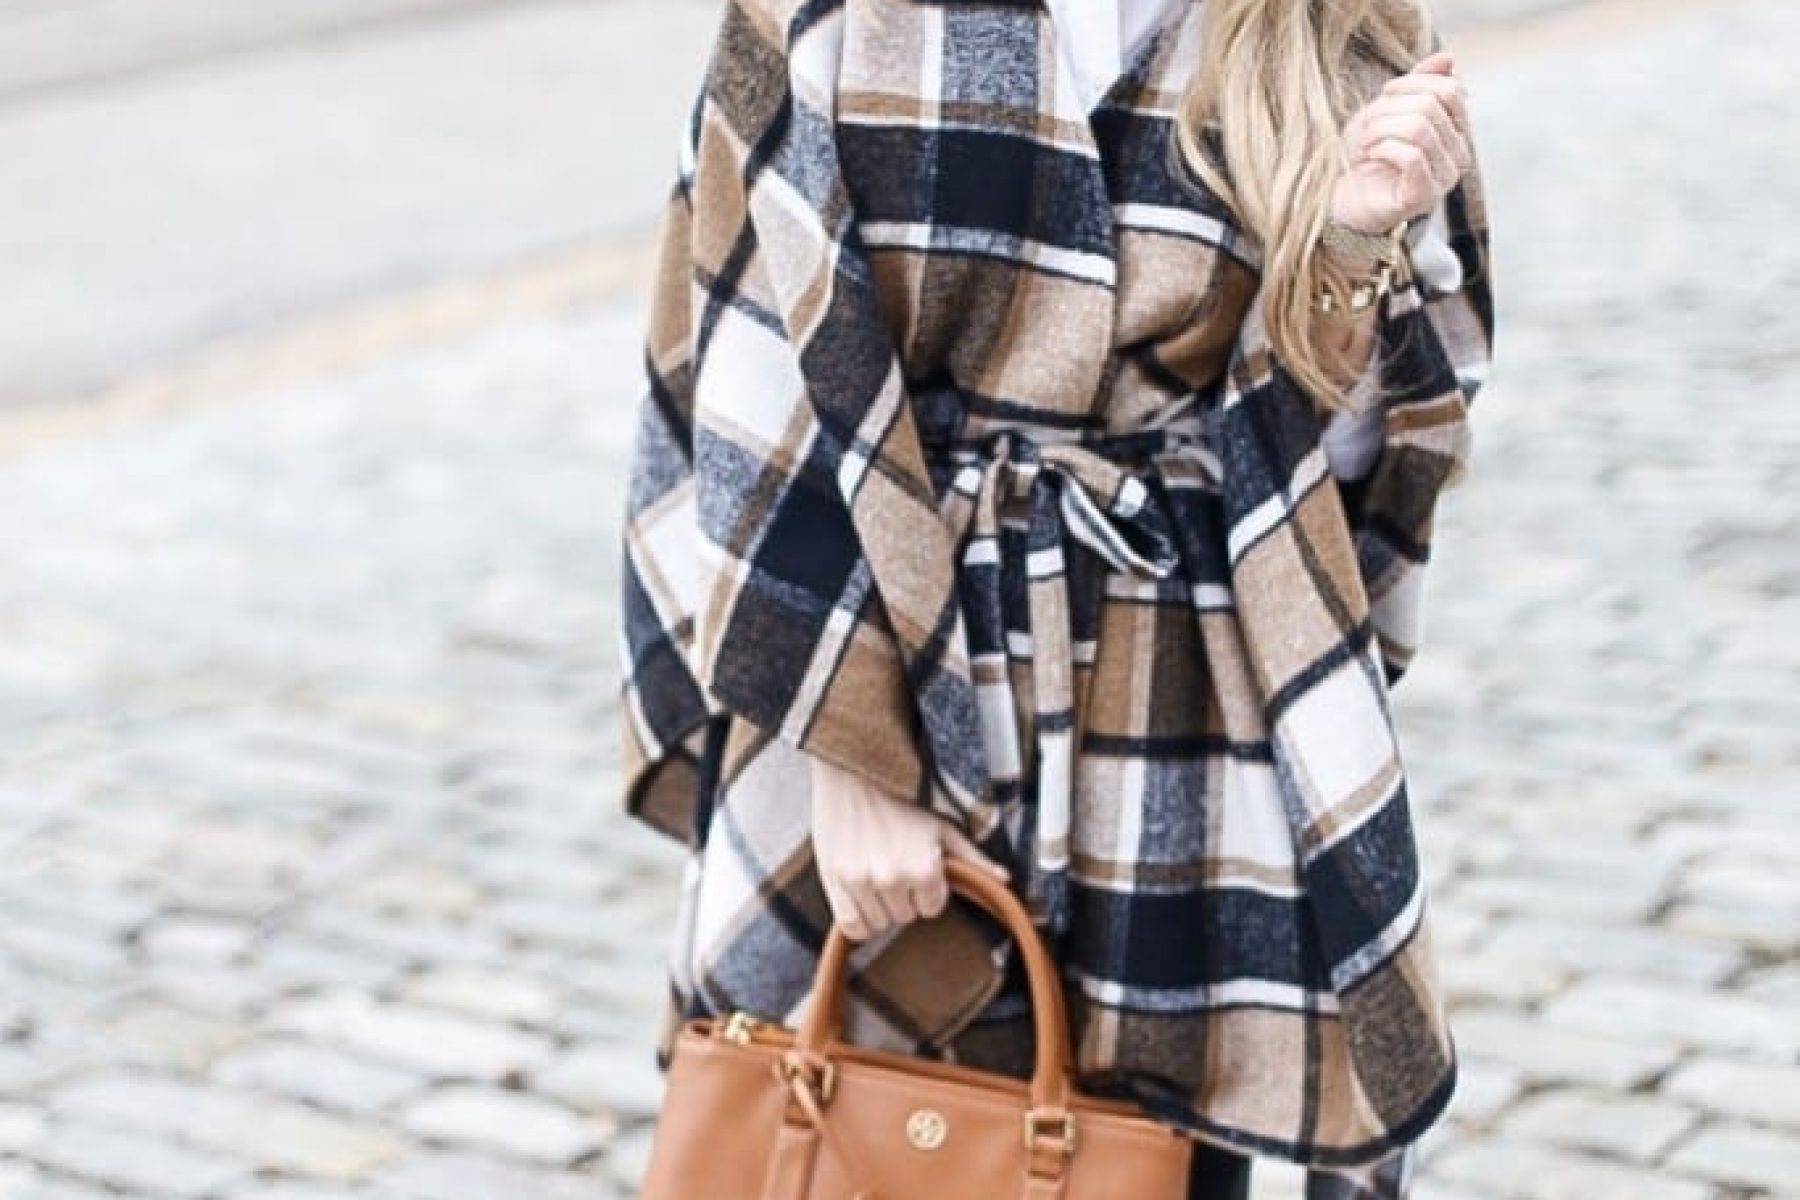 Winter-Fashion-Afternoon-Espresso-Blogger-Poncho-Plaid-Tory Burch Bag (7 of 7)